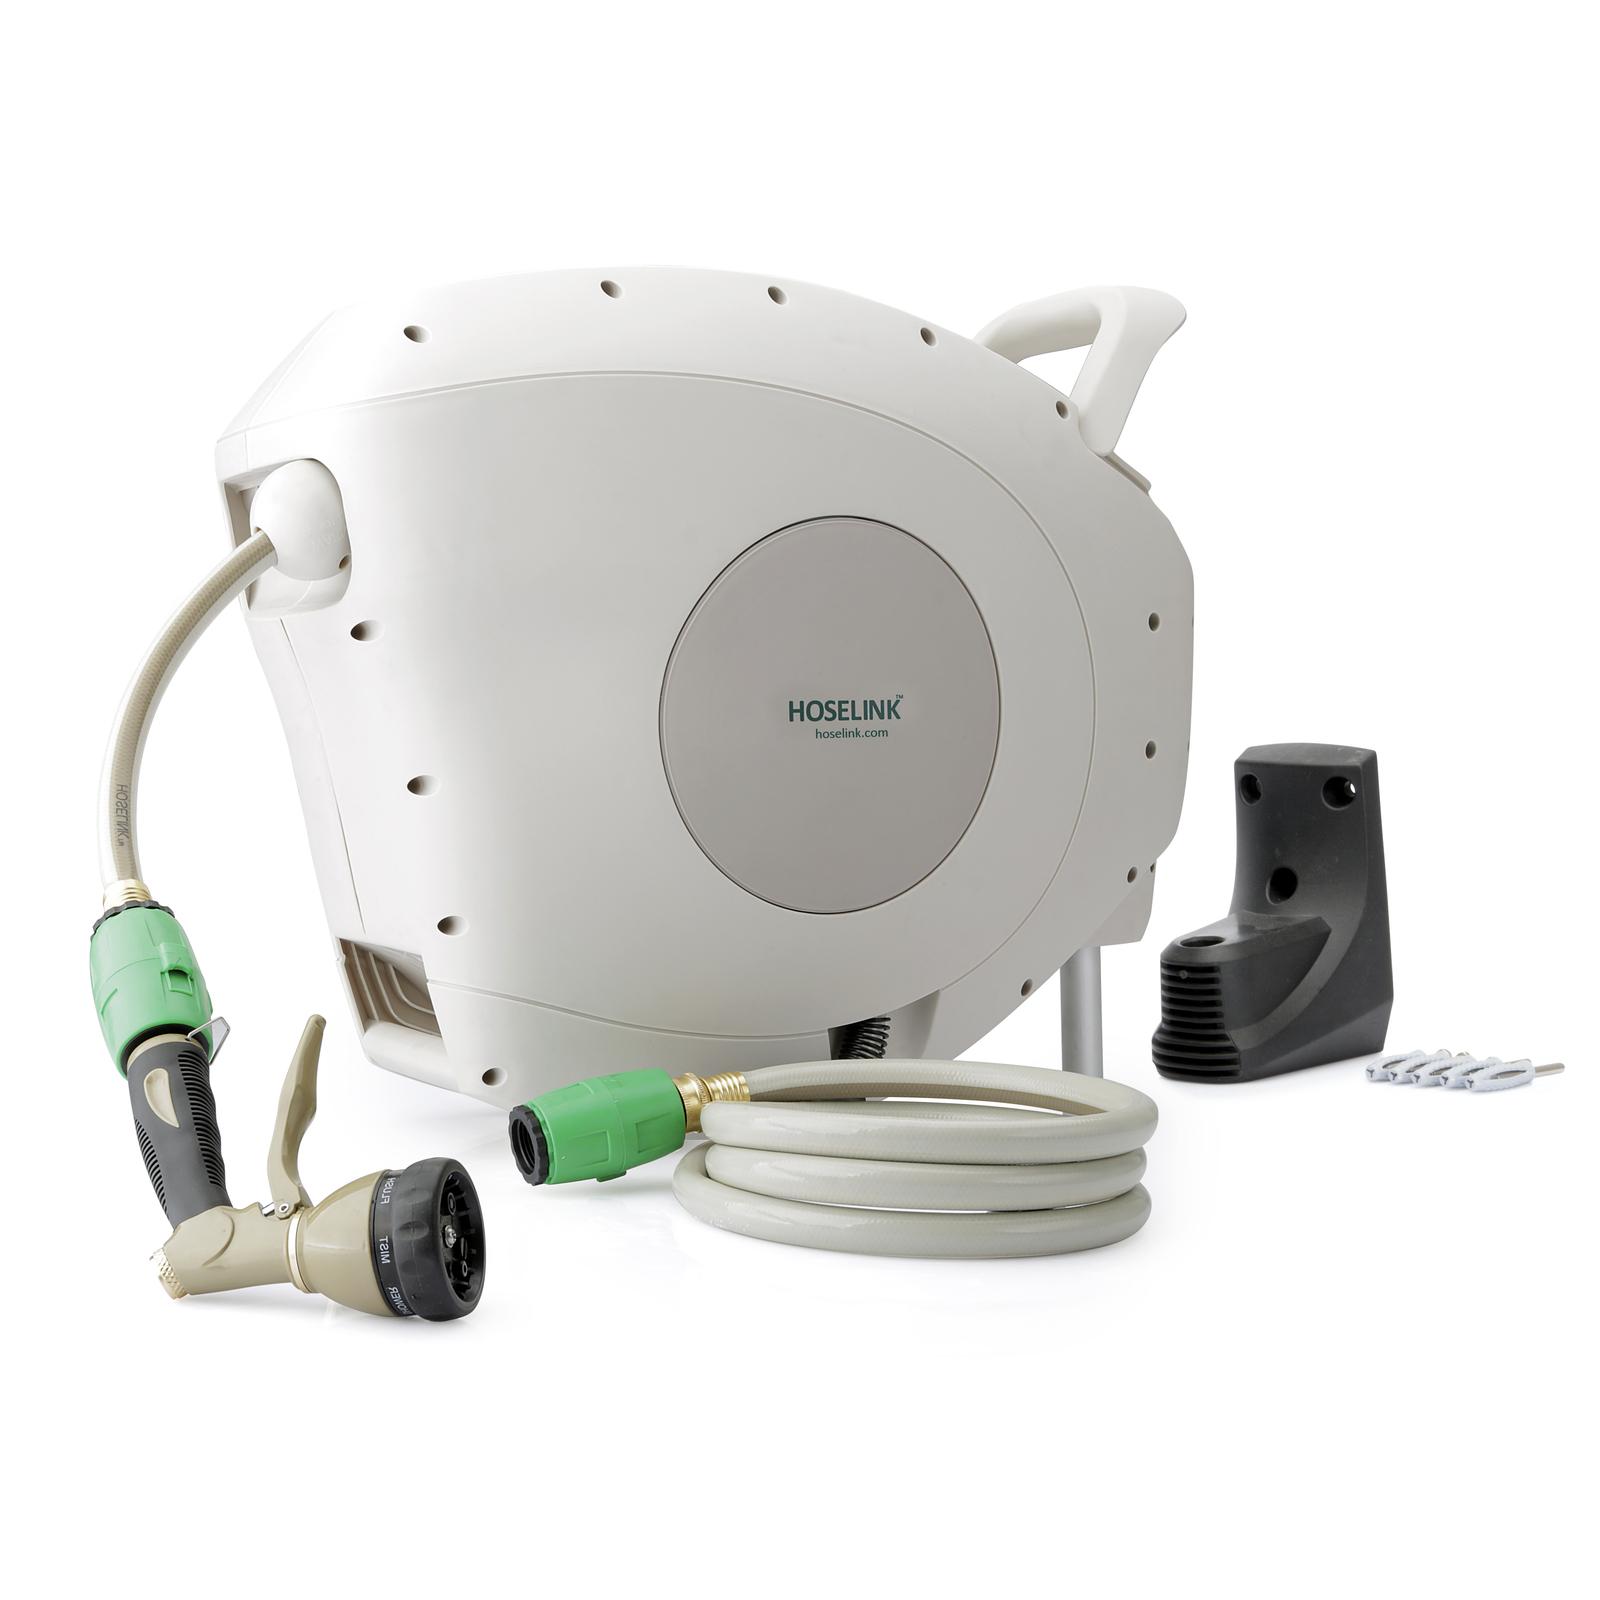 HoseLink Retractable Garden Hose Reel with 7 Function Spray Nozzle (82 Ft)